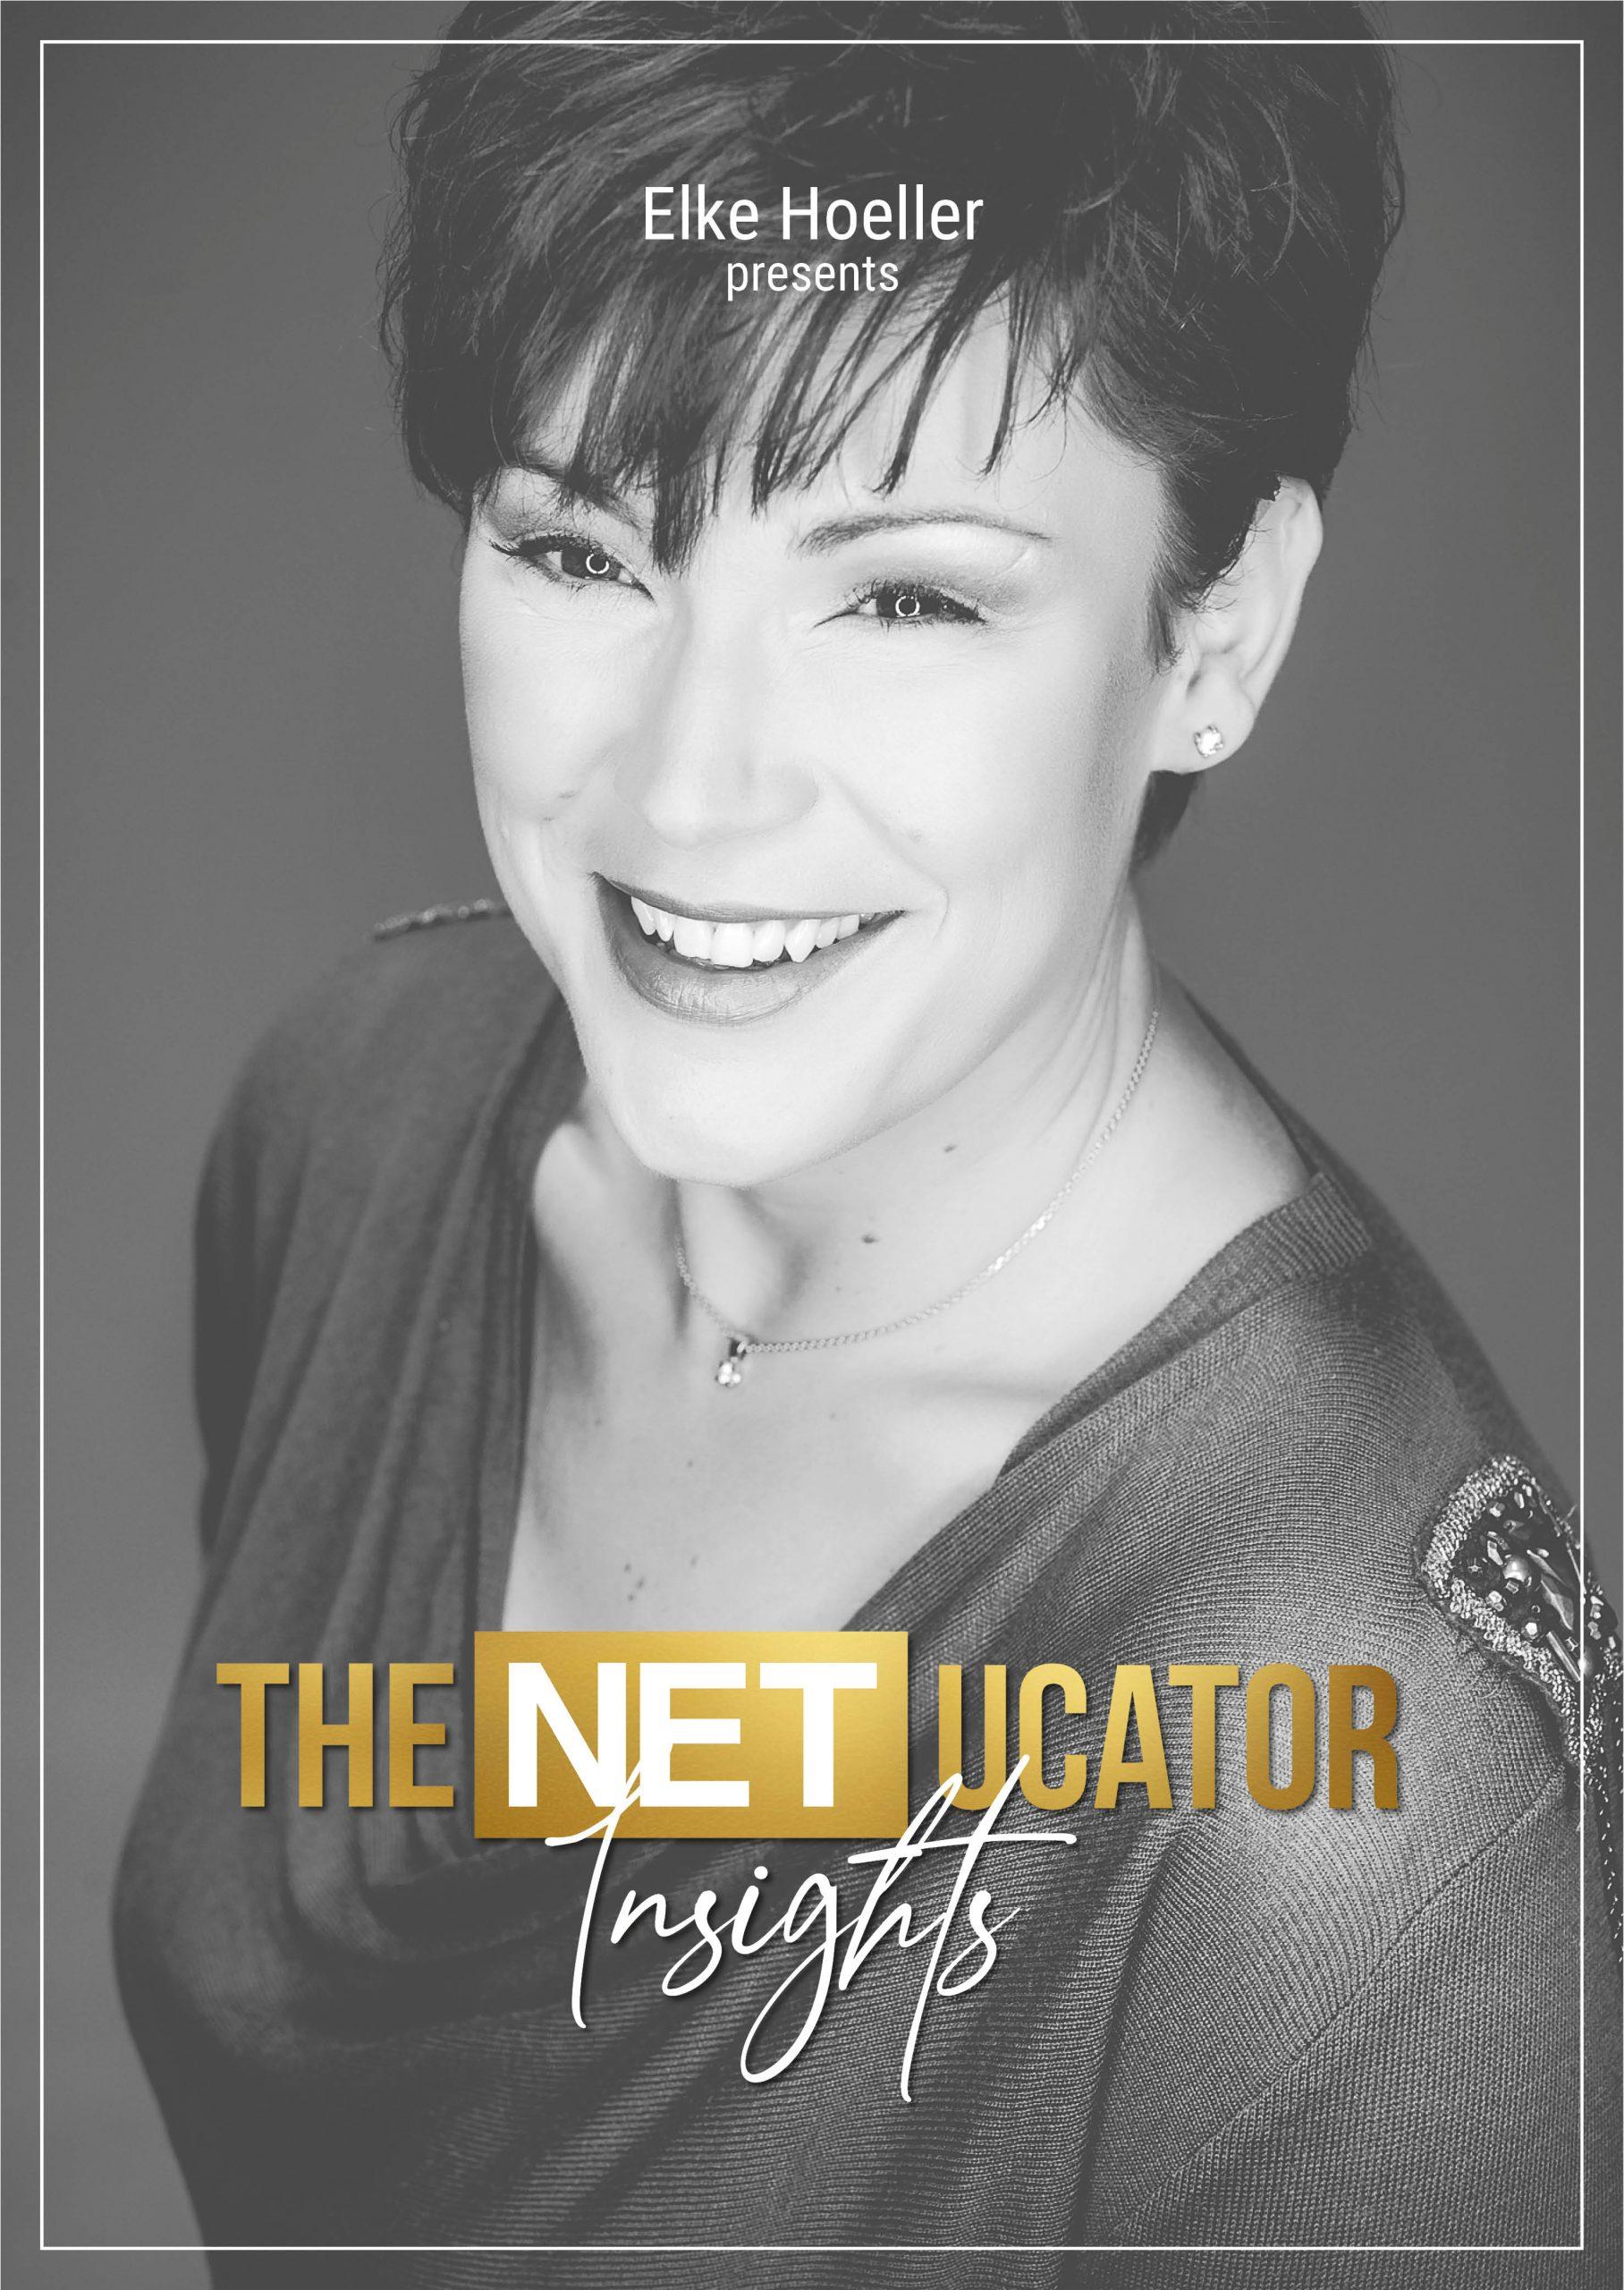 The NETucator Insights – Video